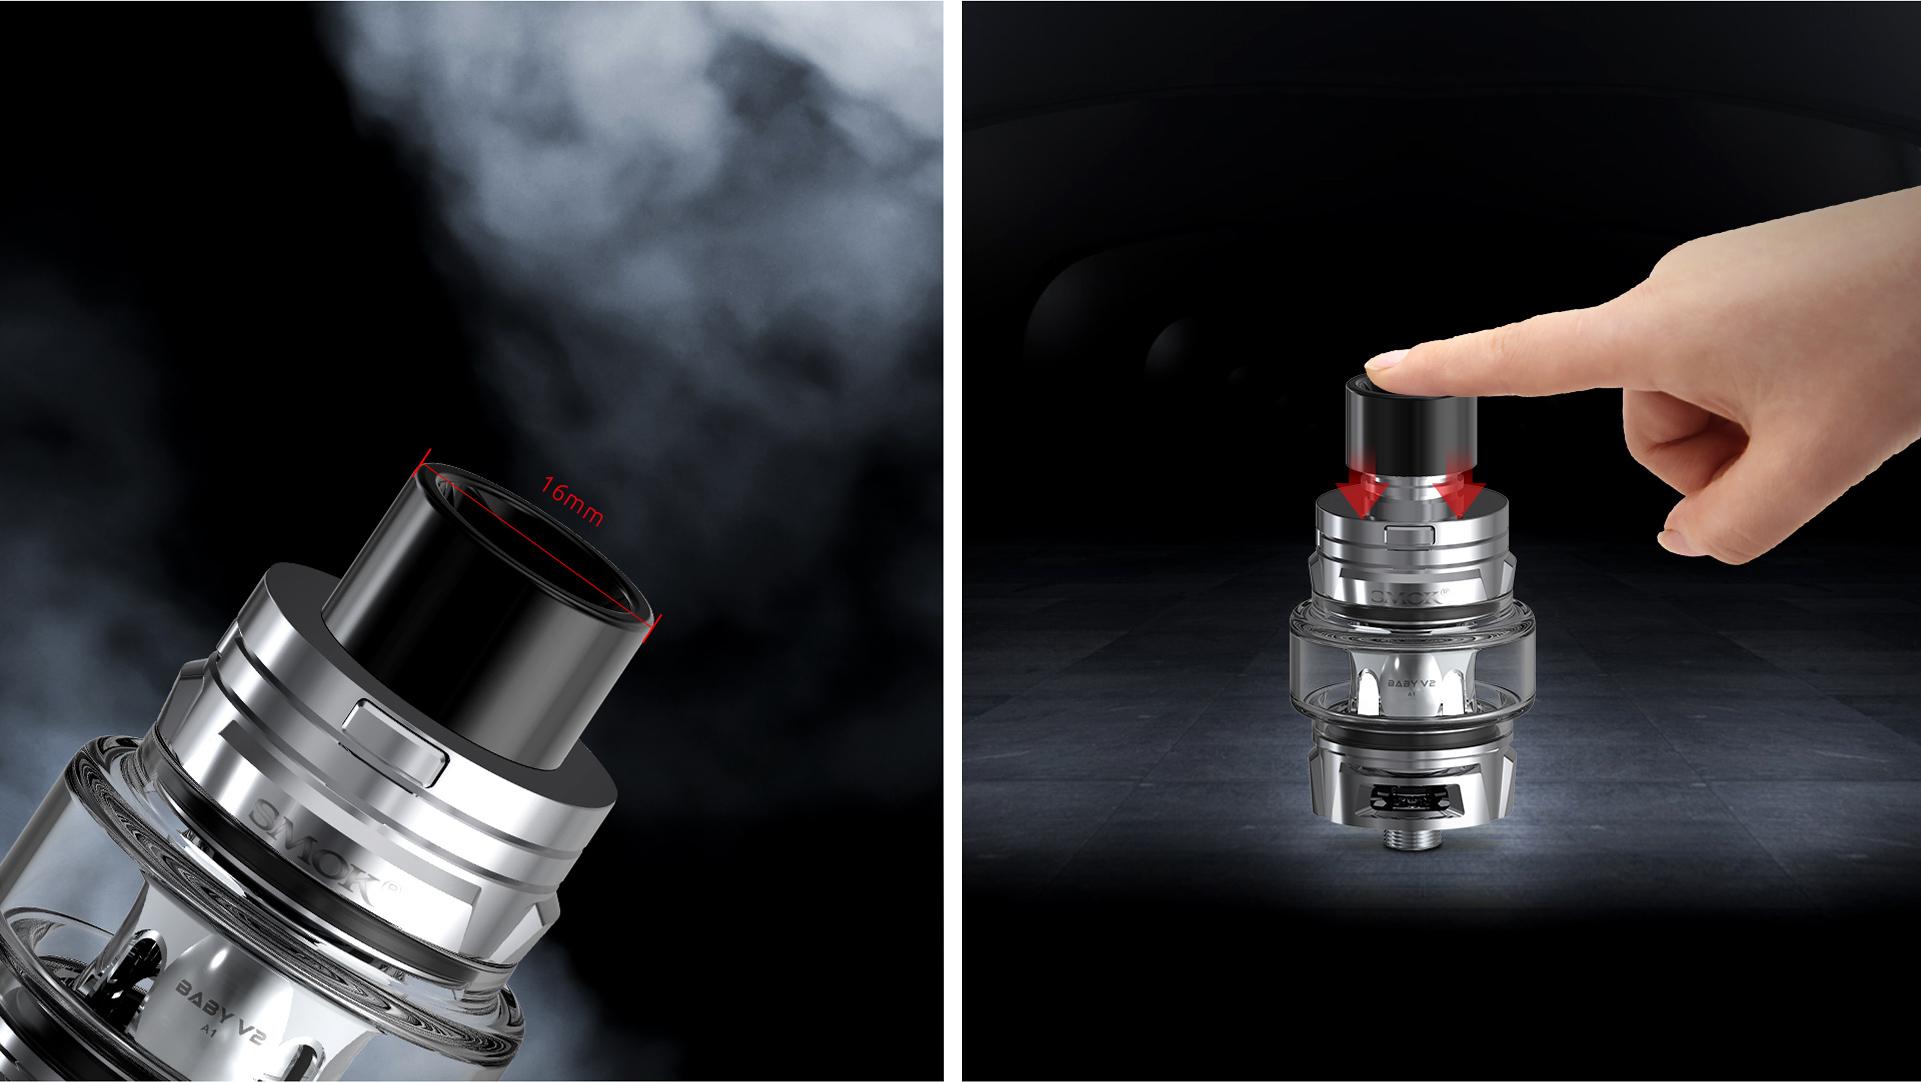 TFV8 Baby V2 Tank - SMOK® Innovation keeps changing the vaping